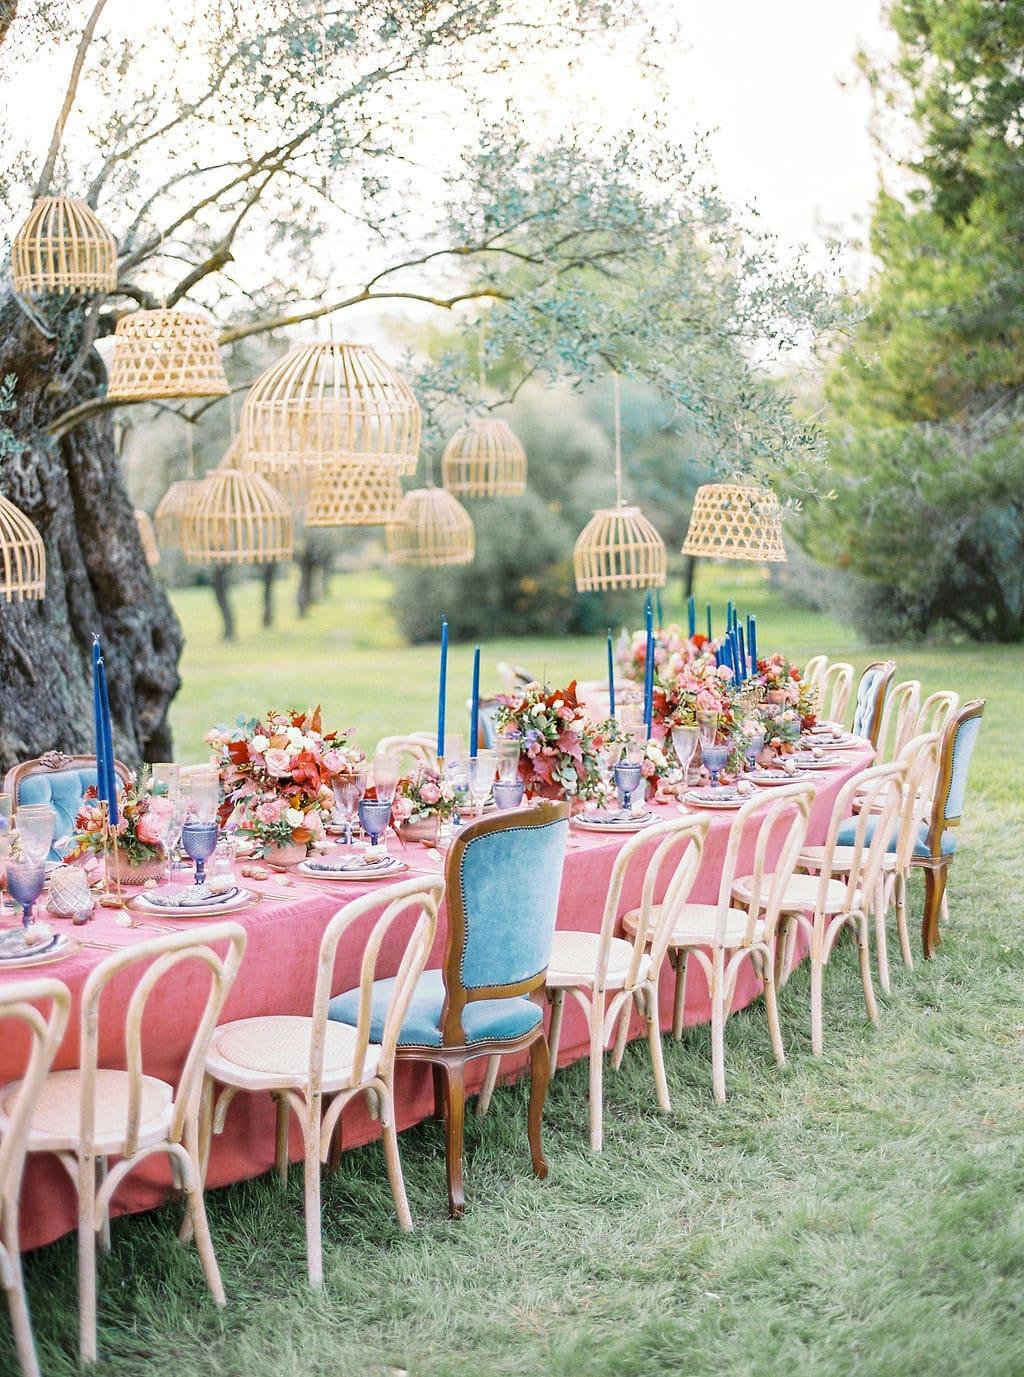 Delikipos-weddings-olive-grove-cyprus